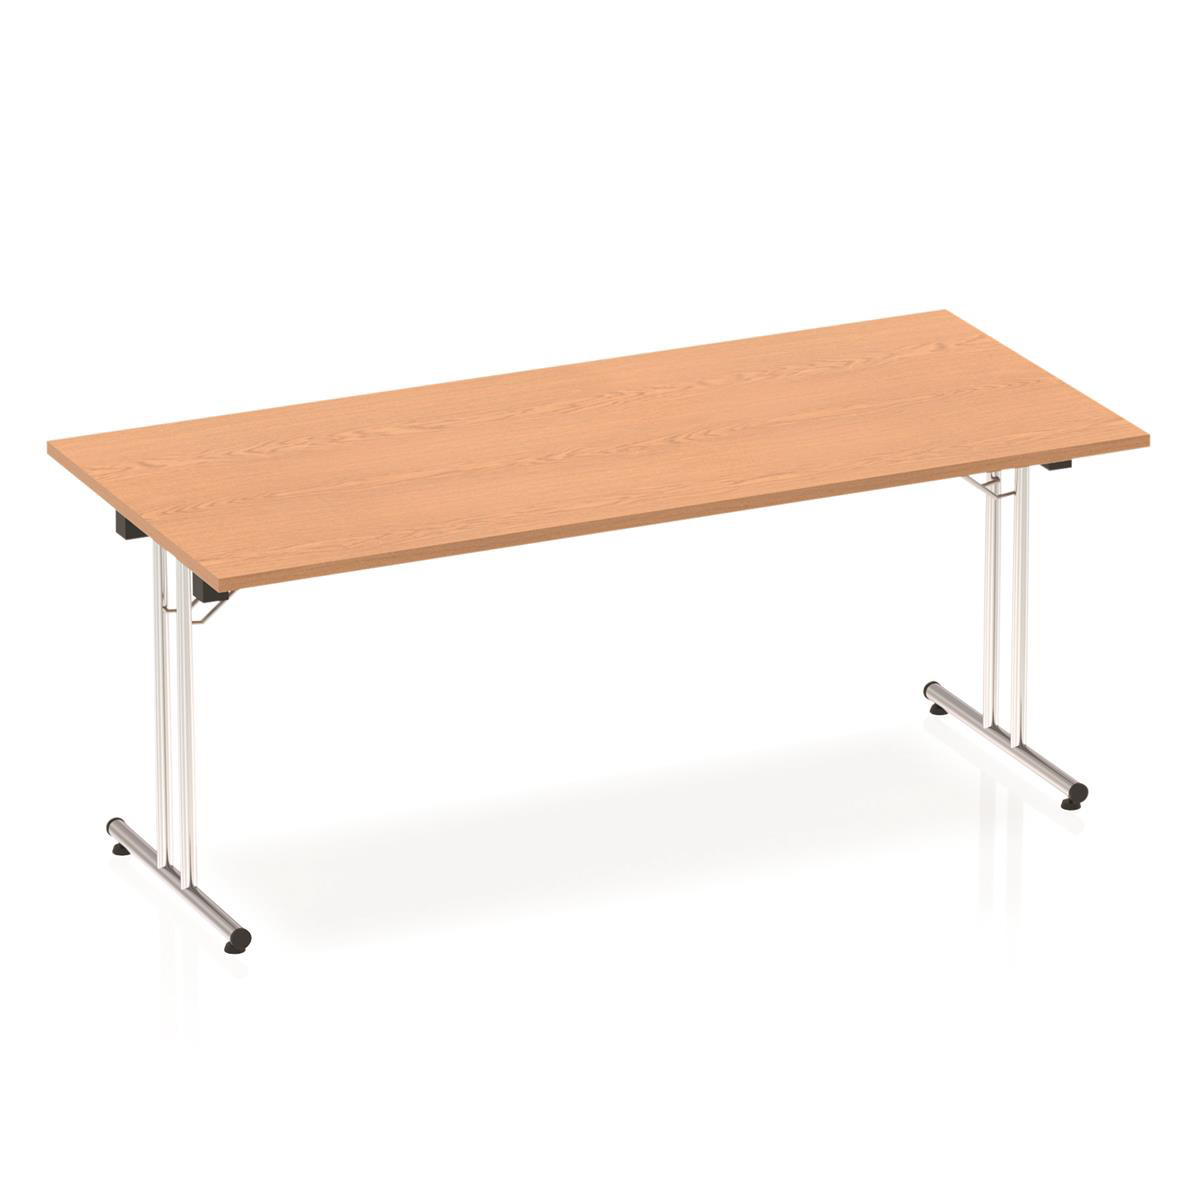 Sonix Rectangular Chrome Leg Folding Meeting Table 1800x800mm Oak Ref I000798